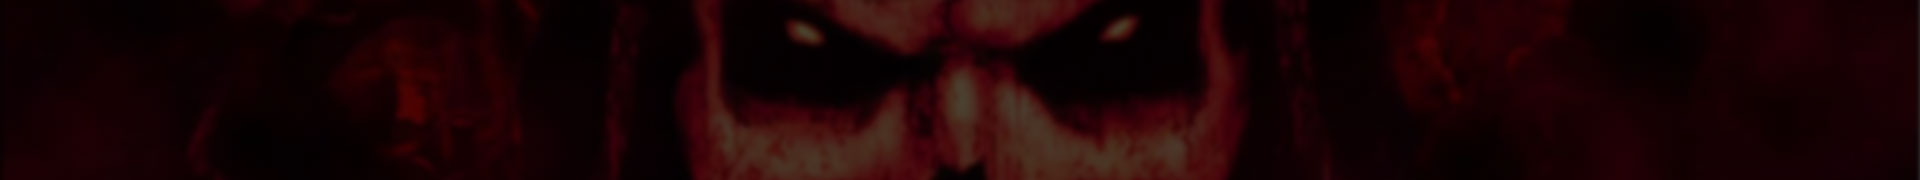 Diablo 2 Resurrected Items